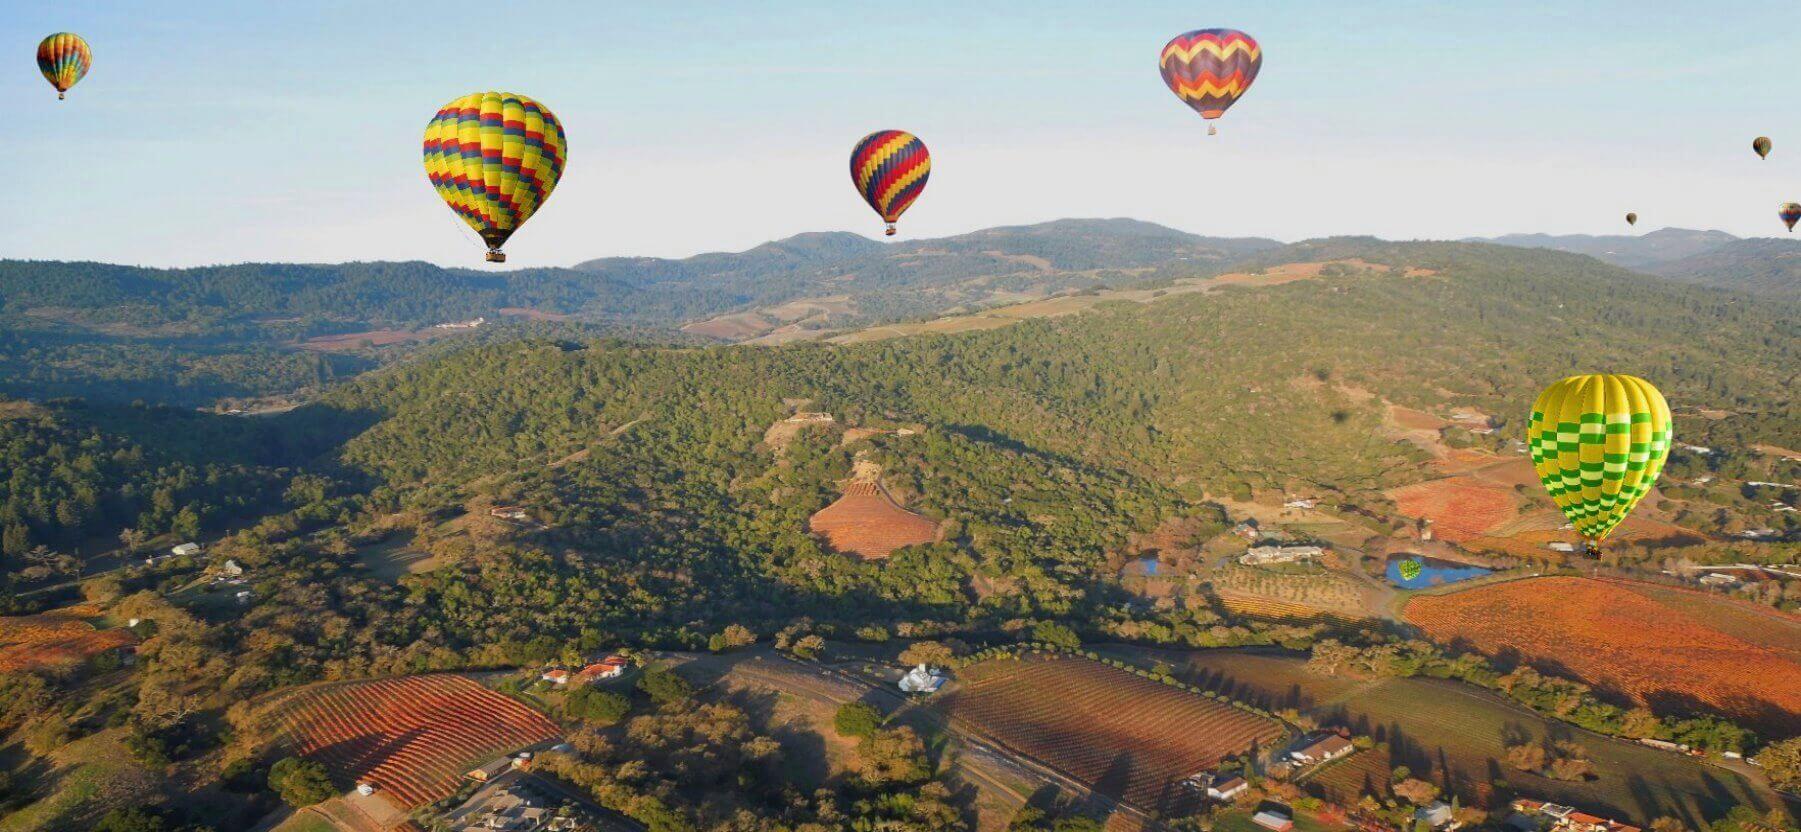 Thrilling-Hot-Air-Balloon-Rides-Over-Napa-Valley